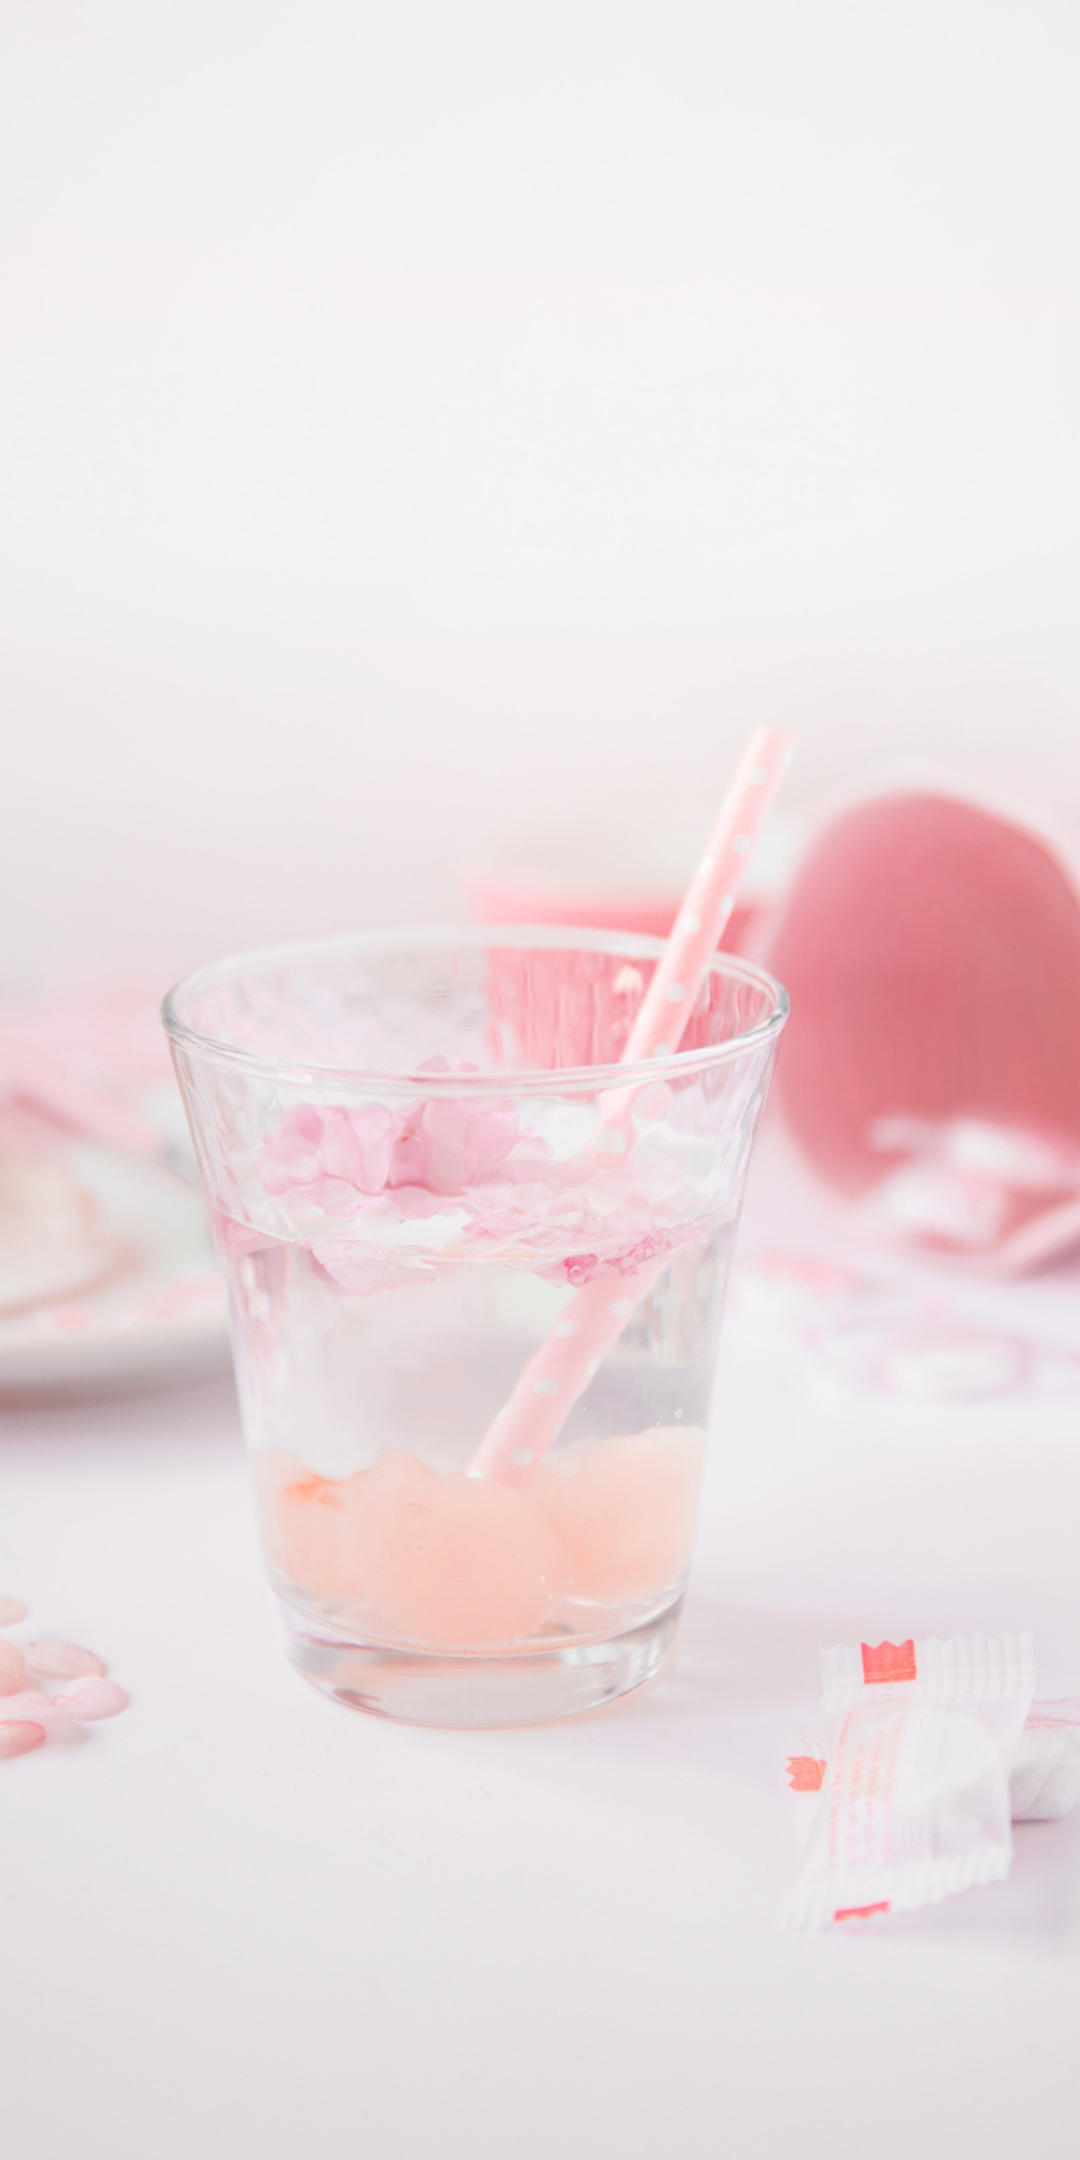 5e67b8966b309 - 粉色系少女心手机壁纸